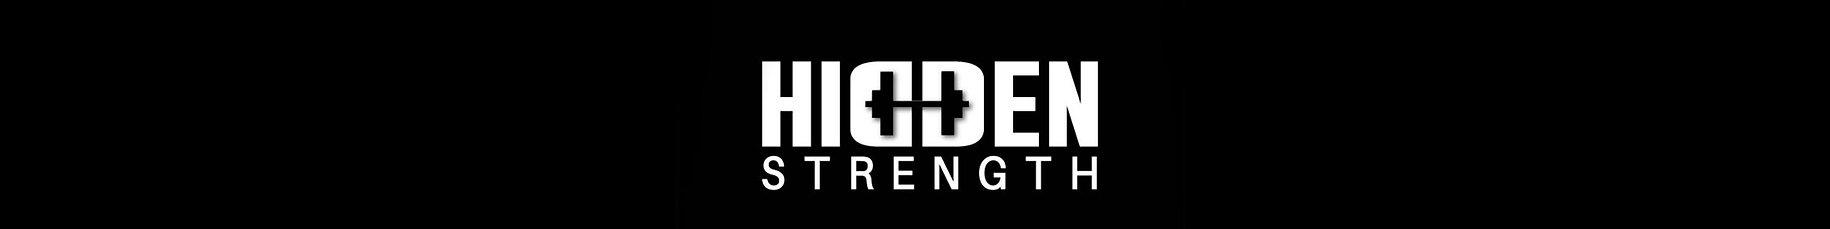 hs logo wide 2.jpg